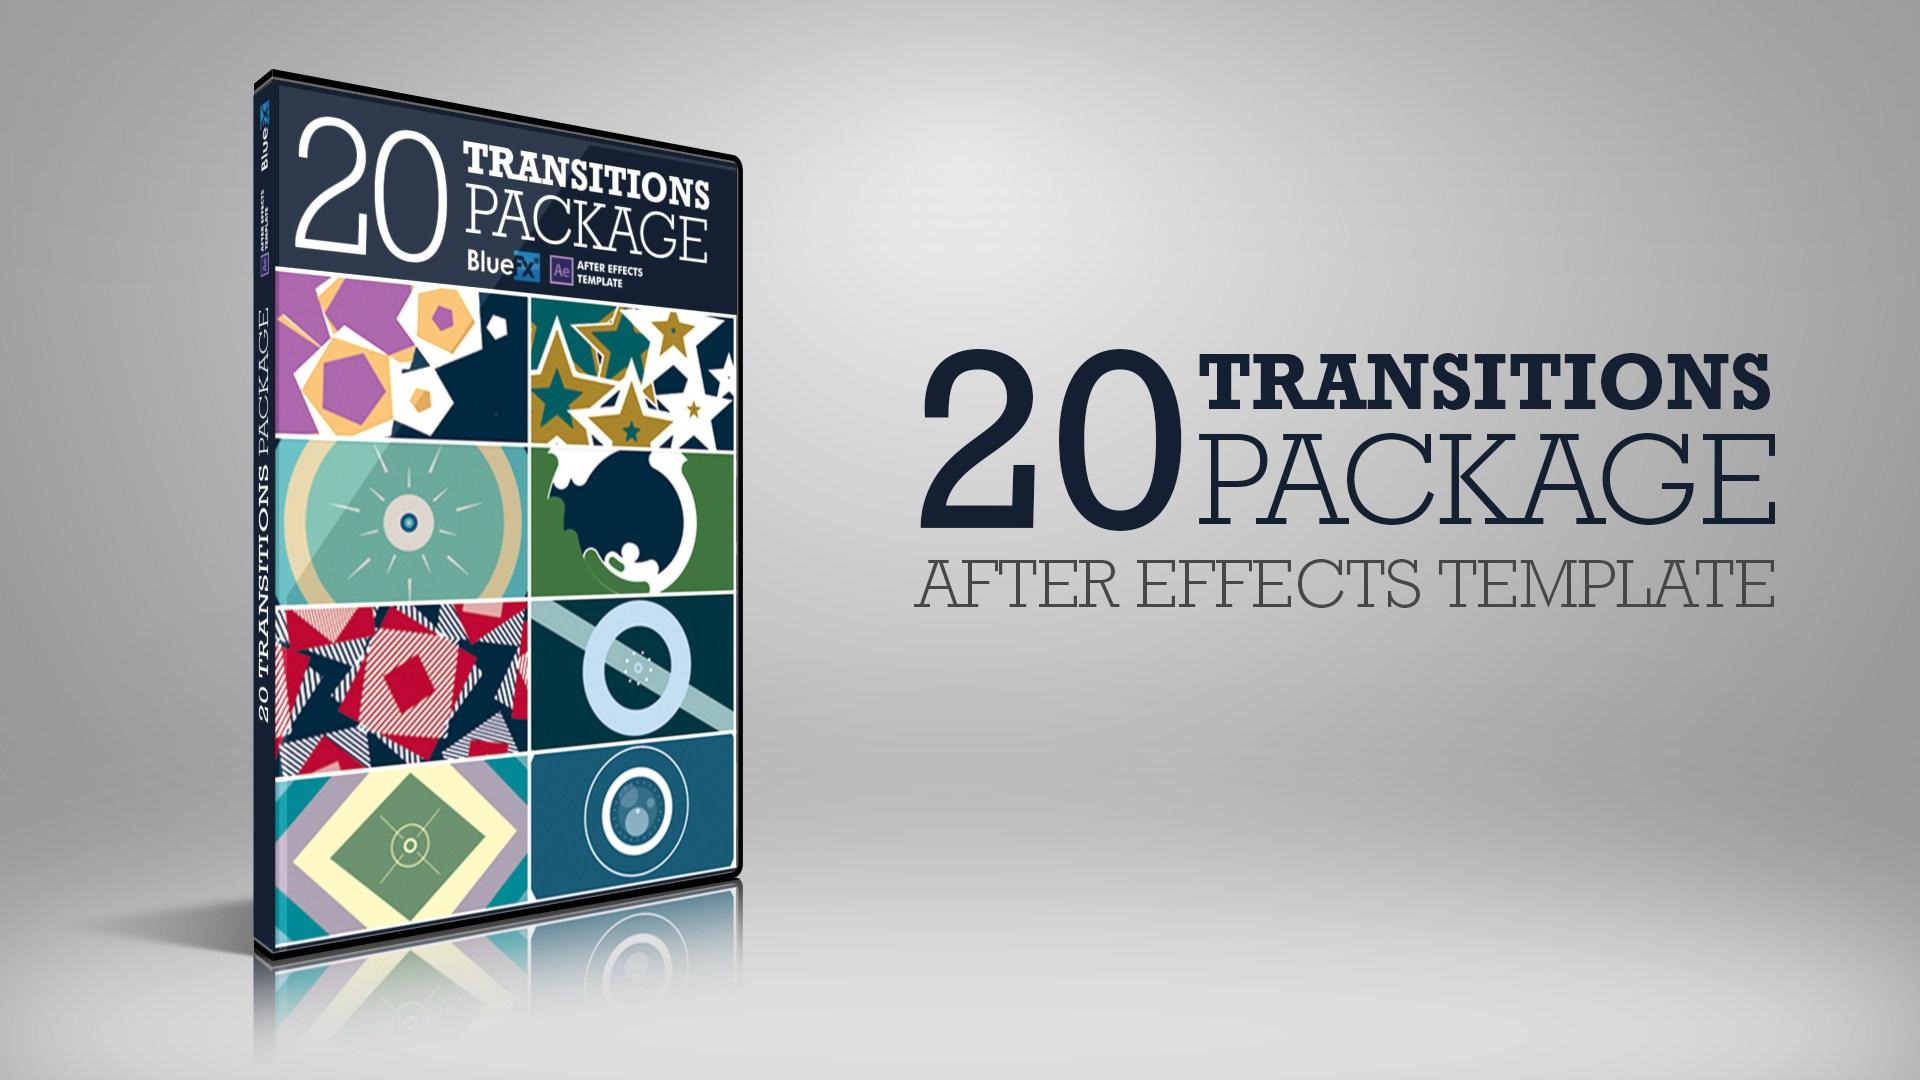 20 Transitions HD - BlueFx